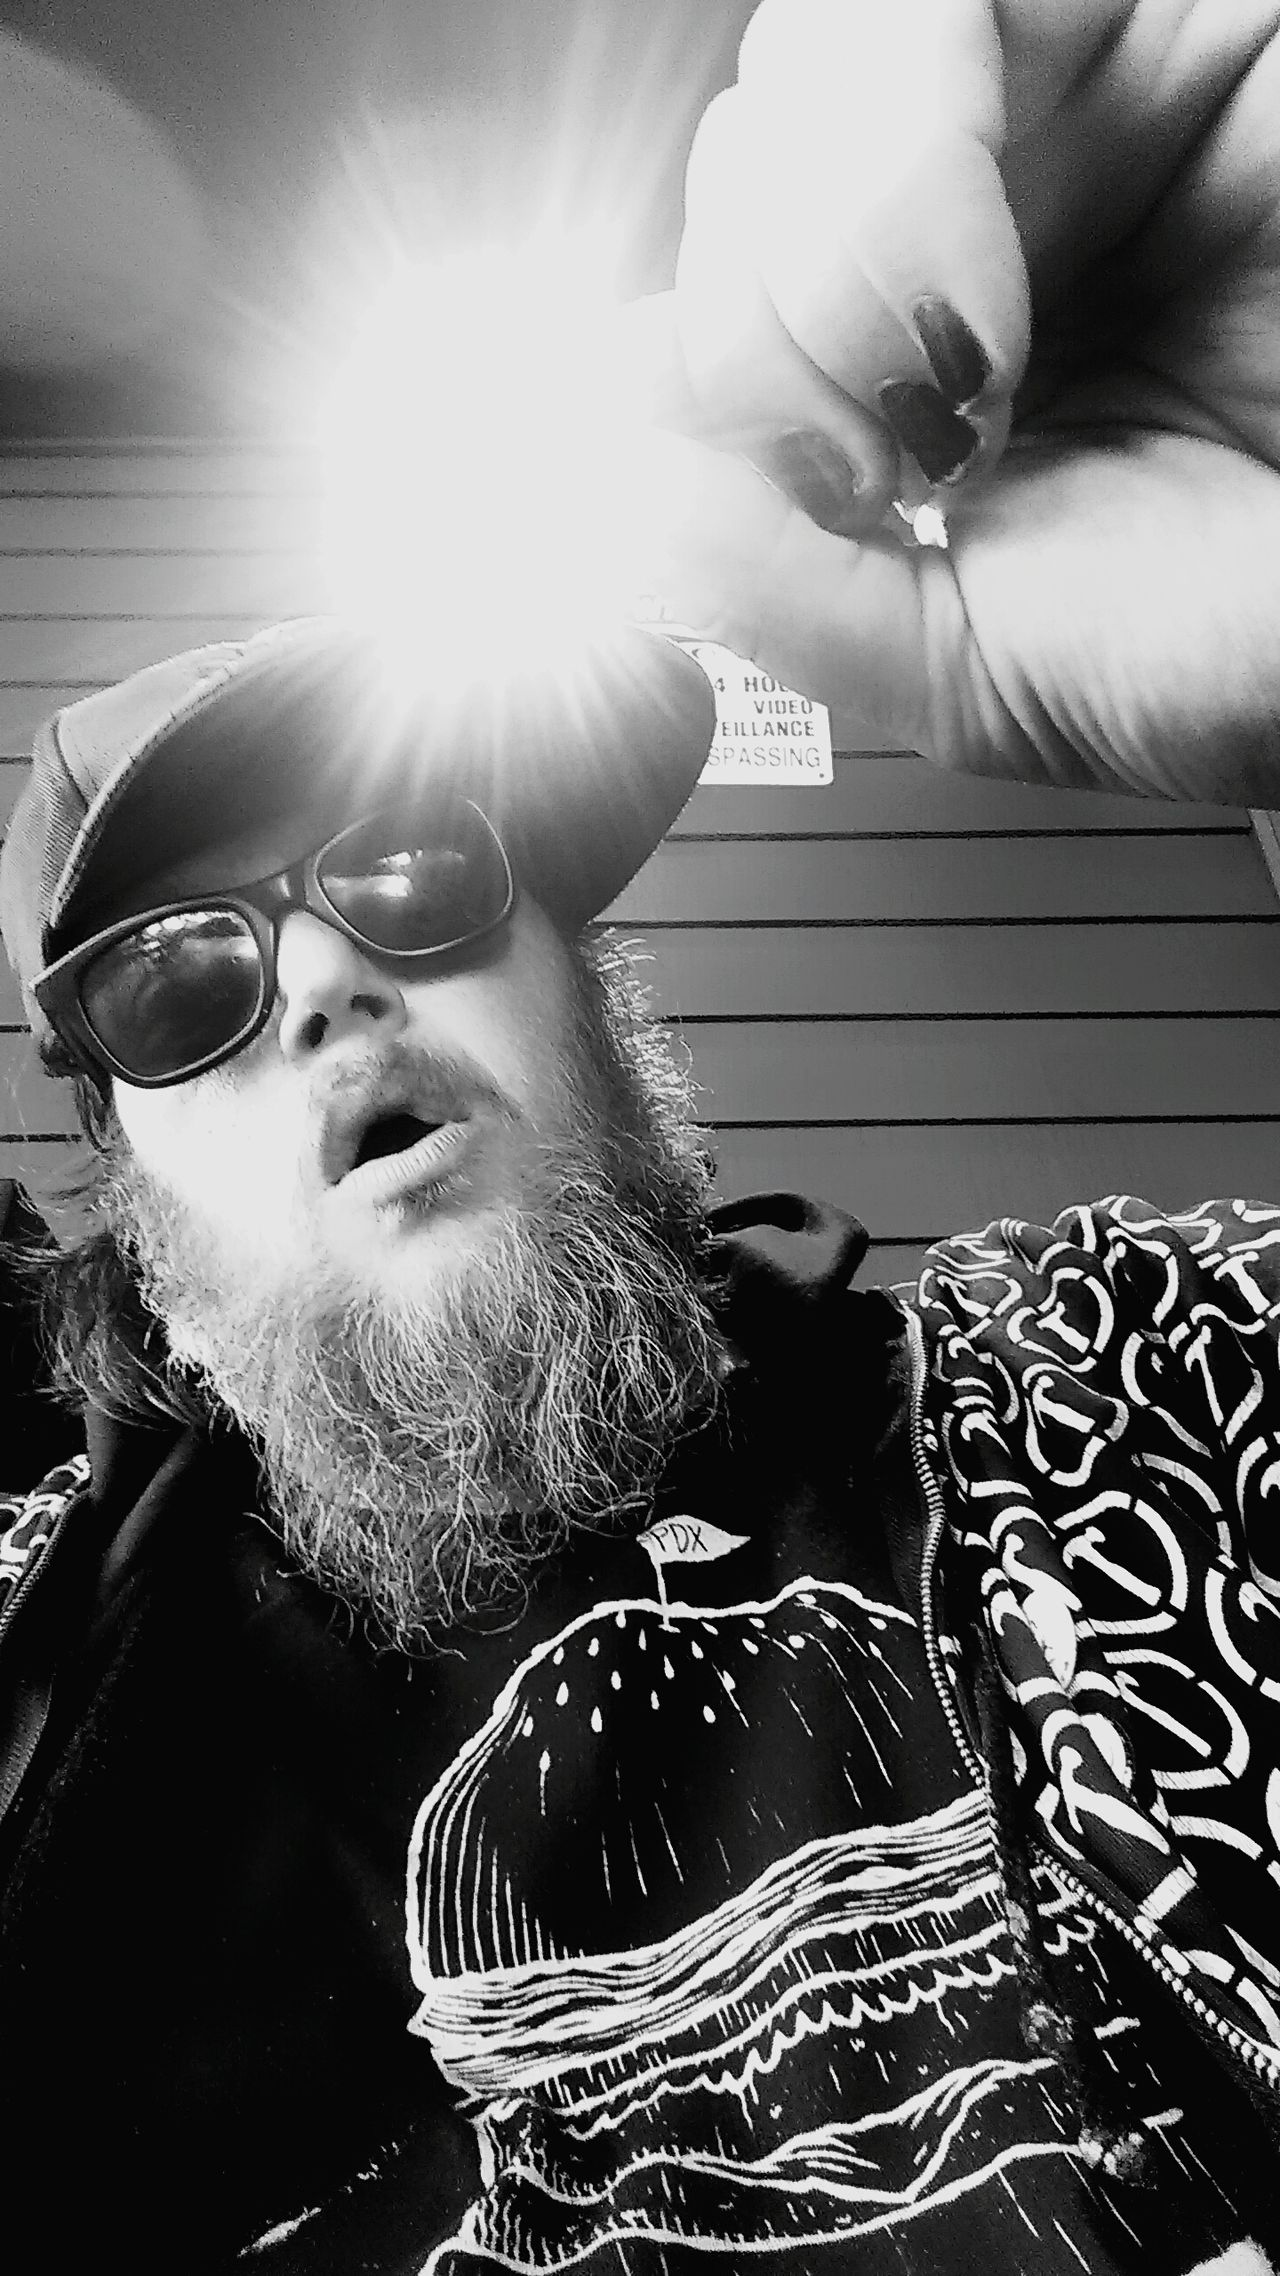 Catch A Sunbeam Catching A Sun Ray Black And White Photography Black And White Portrait Sunbeam Sun Catchers Artist Portrait Benjamin Larsen Artist Portrait That's Me Enjoying Life Art Of Benjamin Larsen Black Shoes Black Hat And Dark Sunglasses Black And White